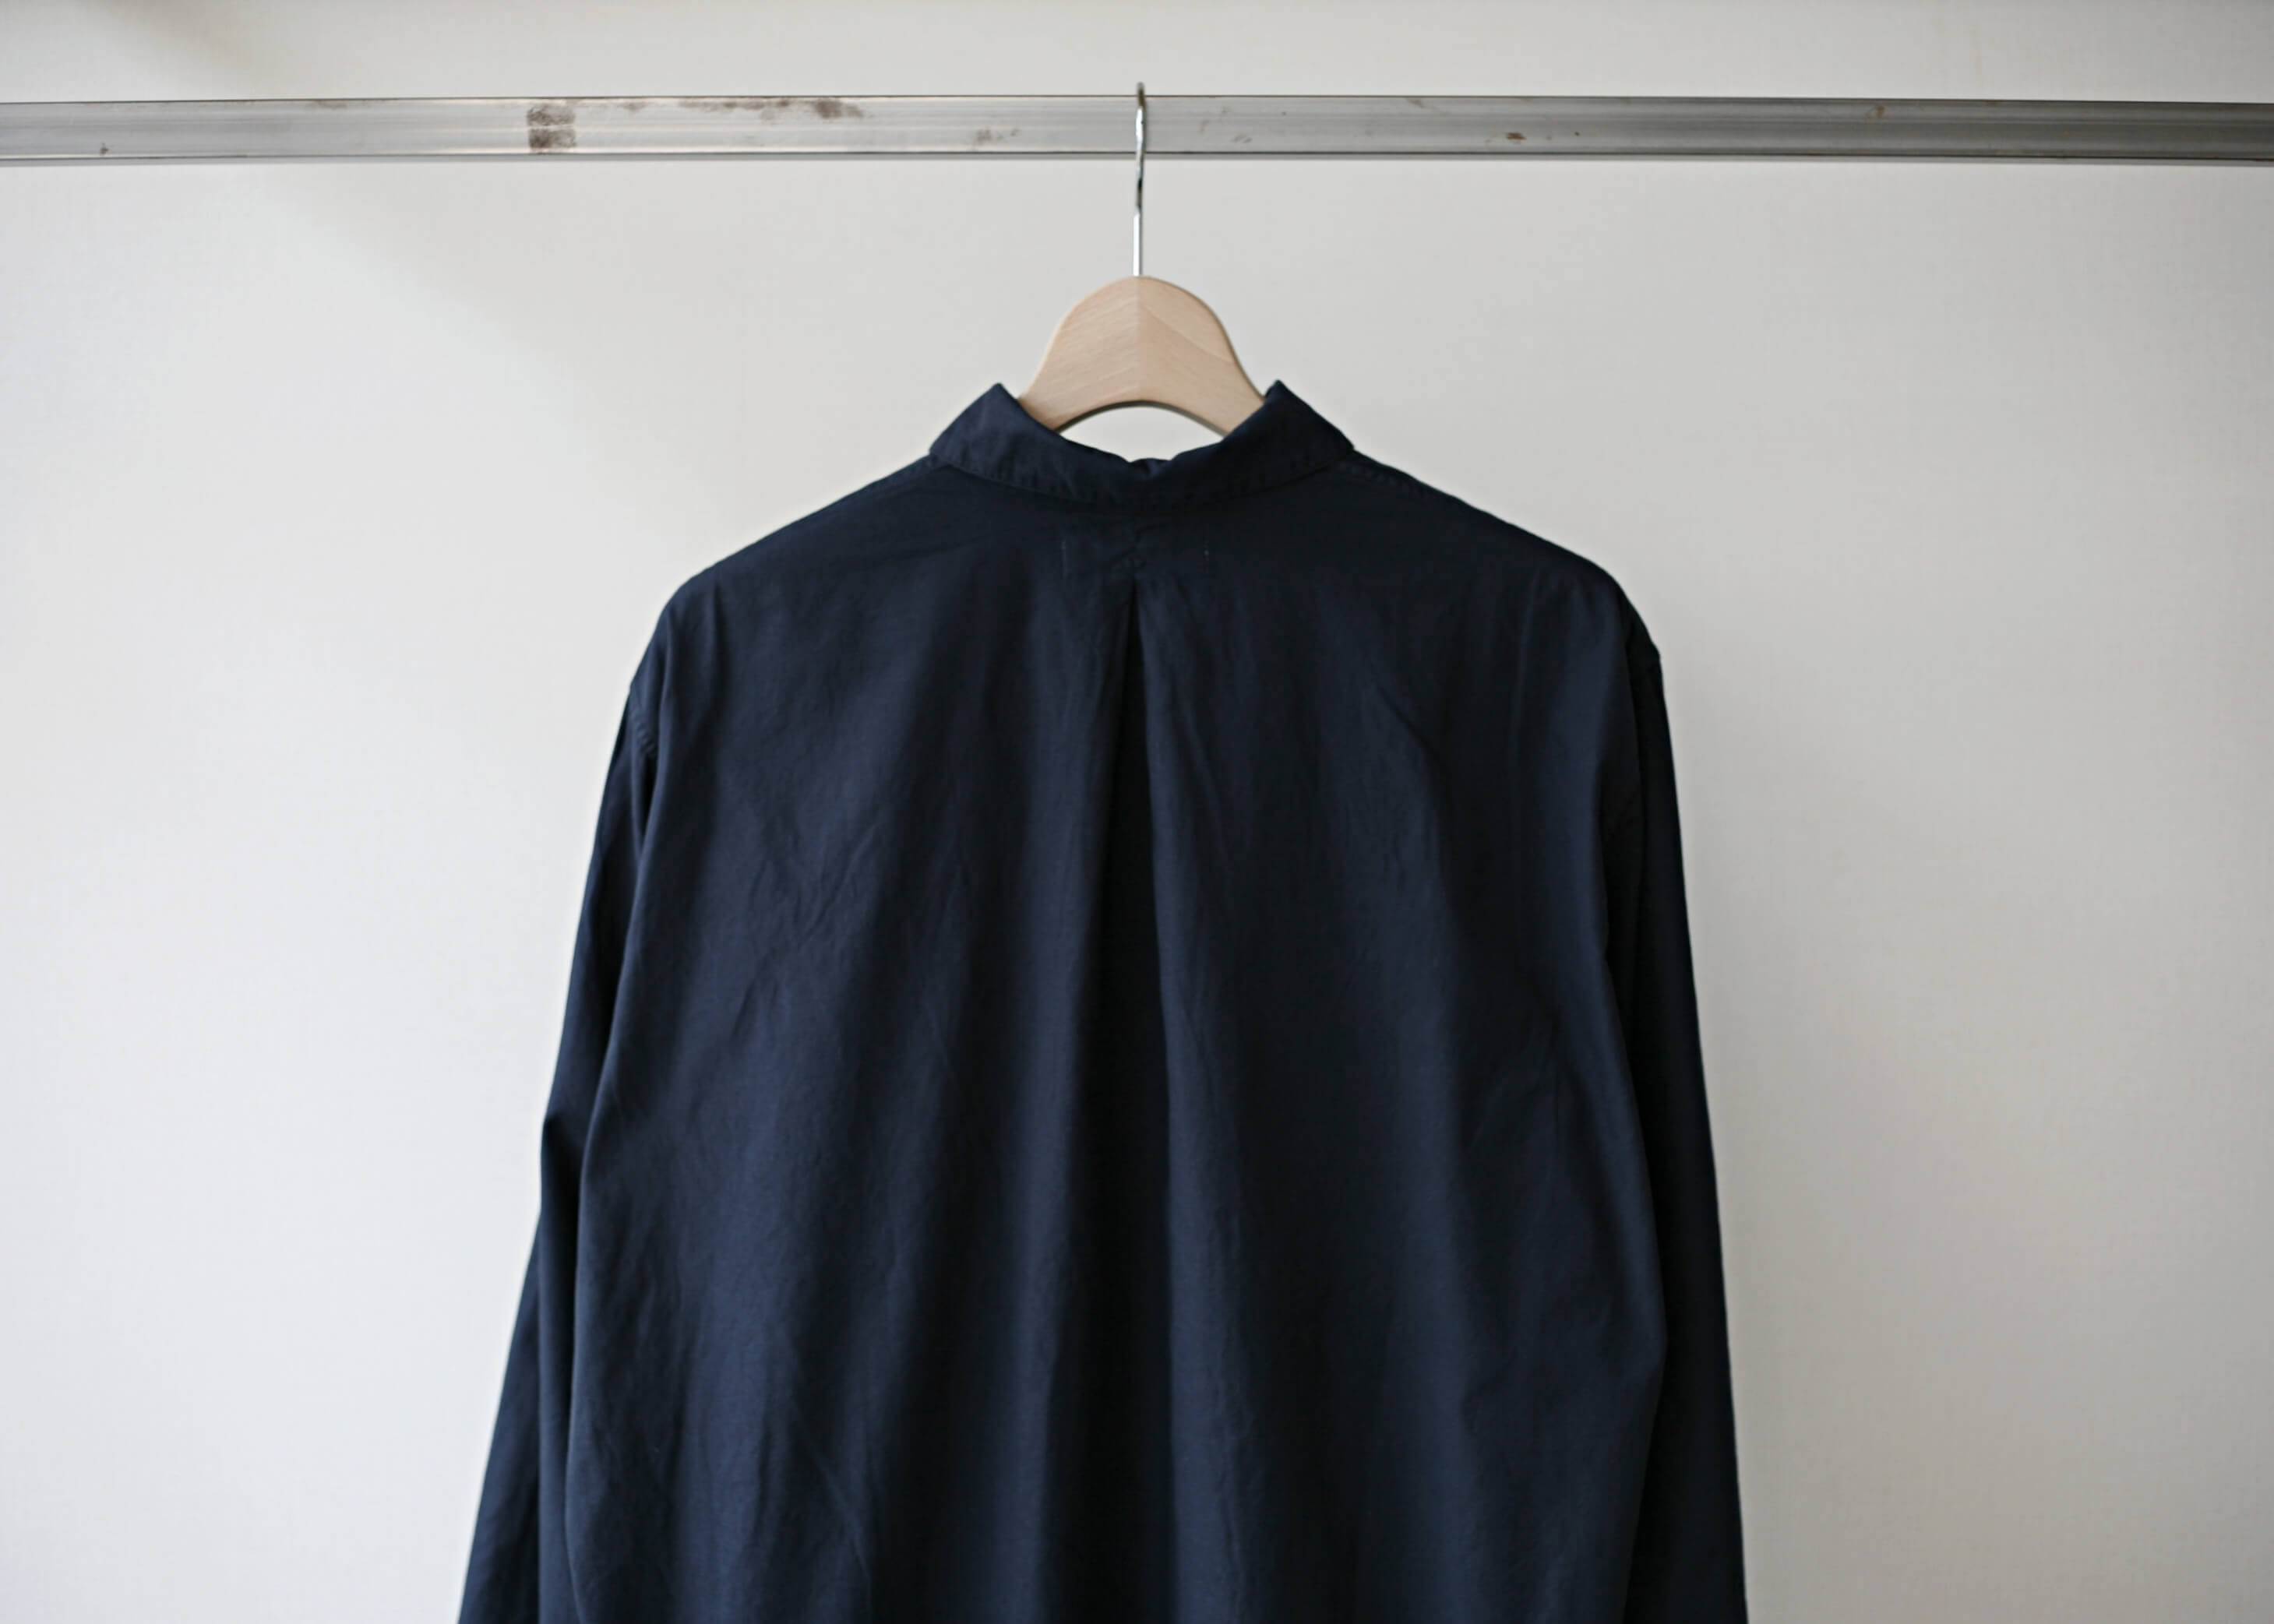 bunt skipper shirts navy バックスタイルのアップ